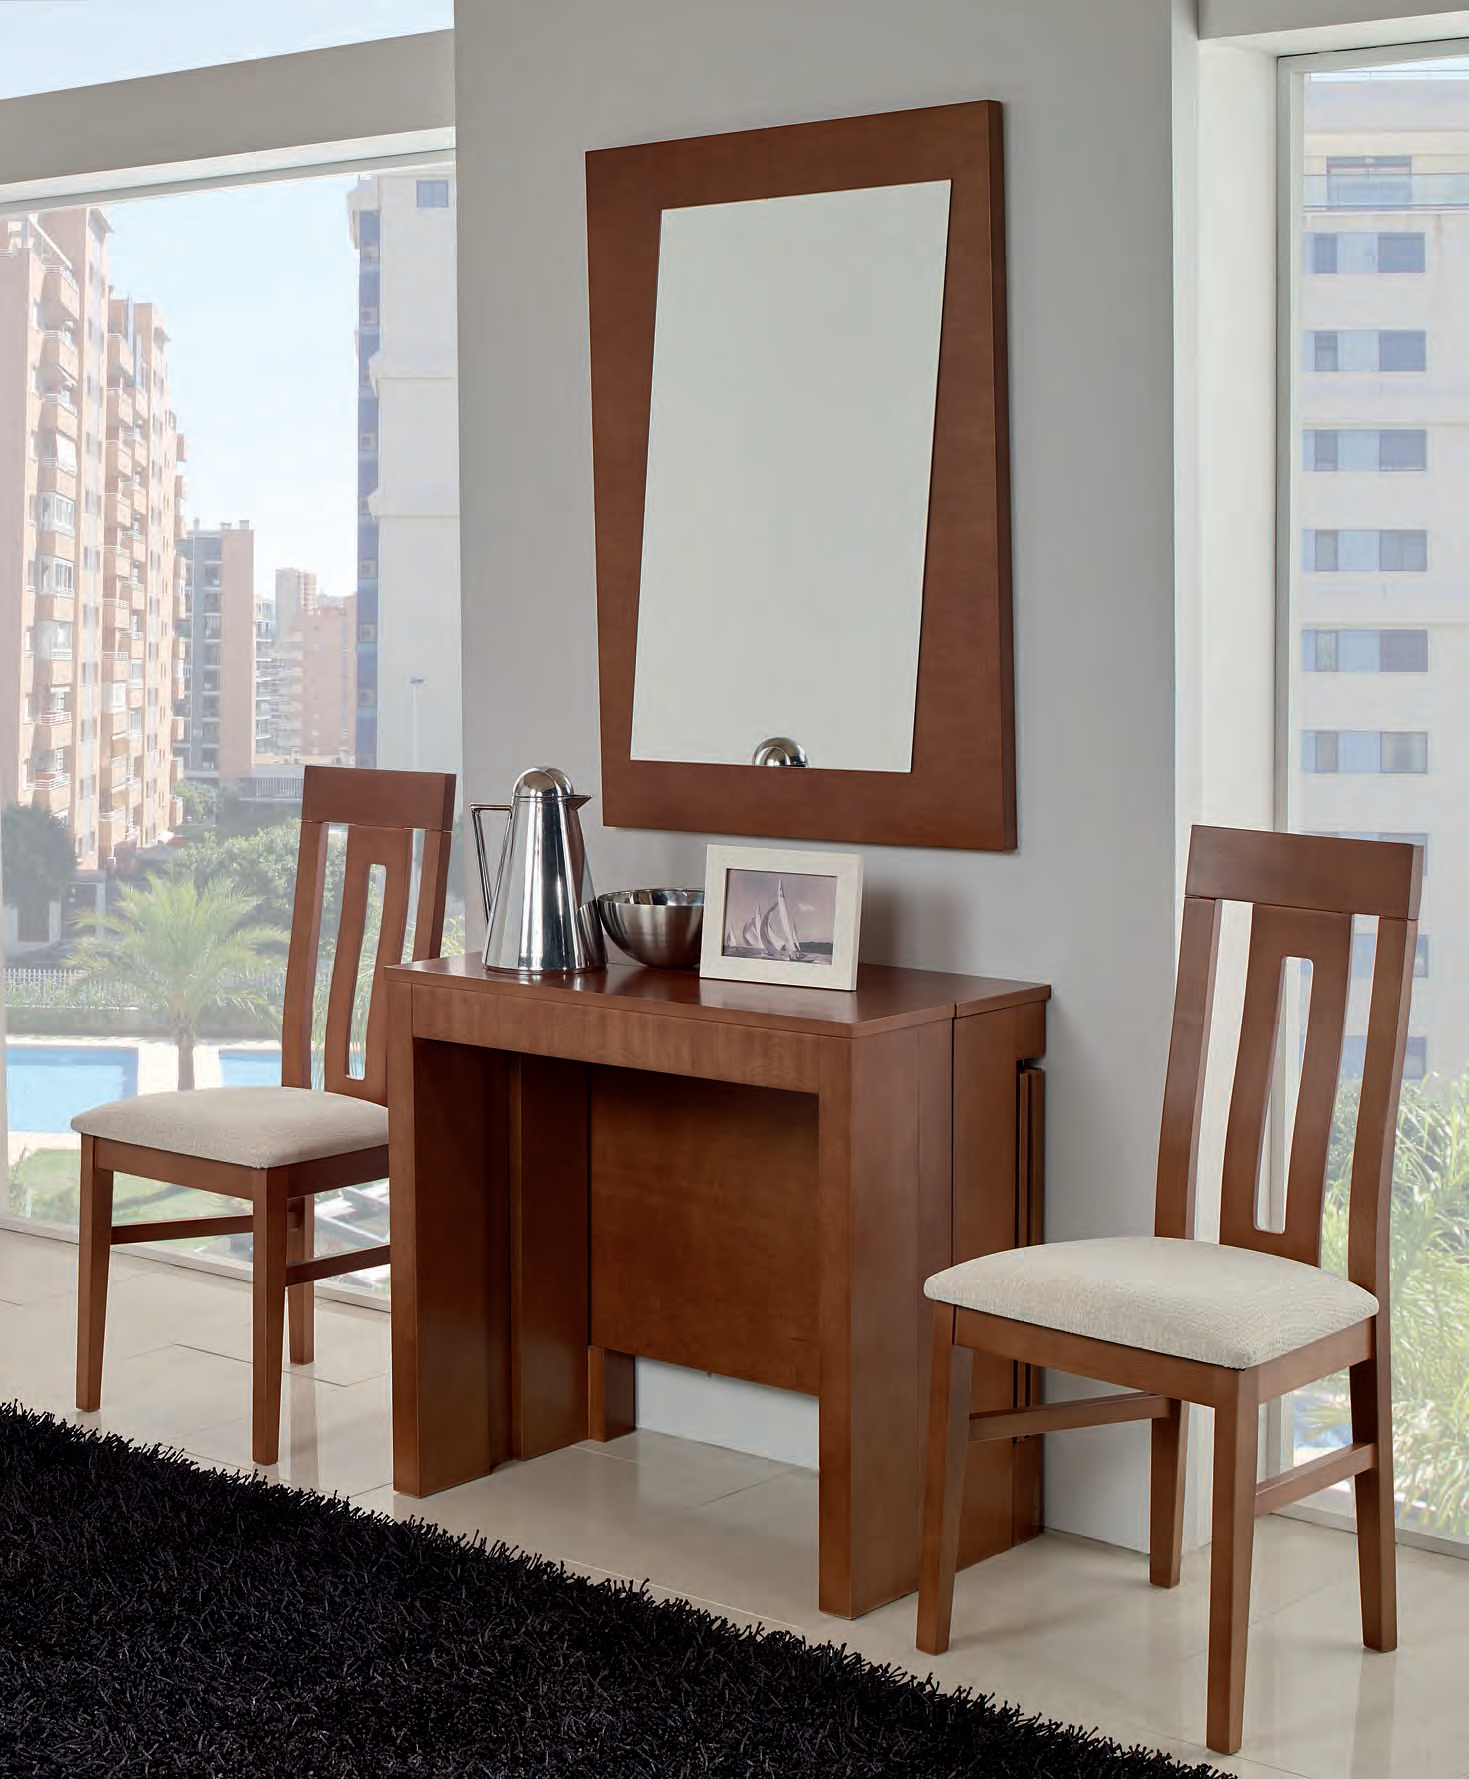 Recibidor mesa de comedor extensible madera muebles - Sillas de recibidor ...